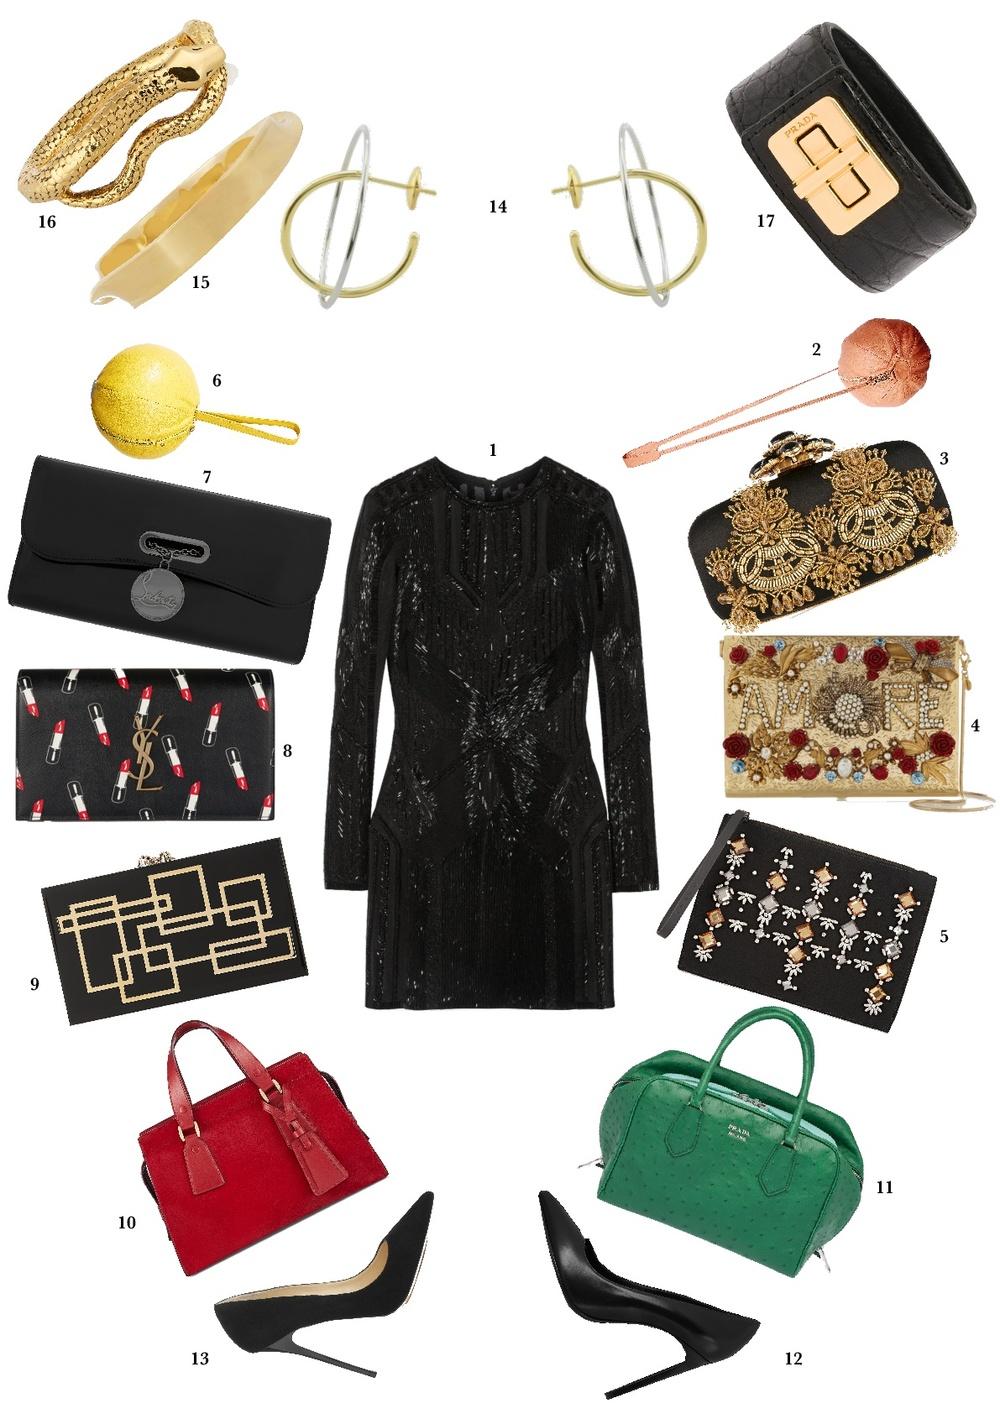 http://www.loptimum.fr/style/shopping-noel-10-dimensions/9